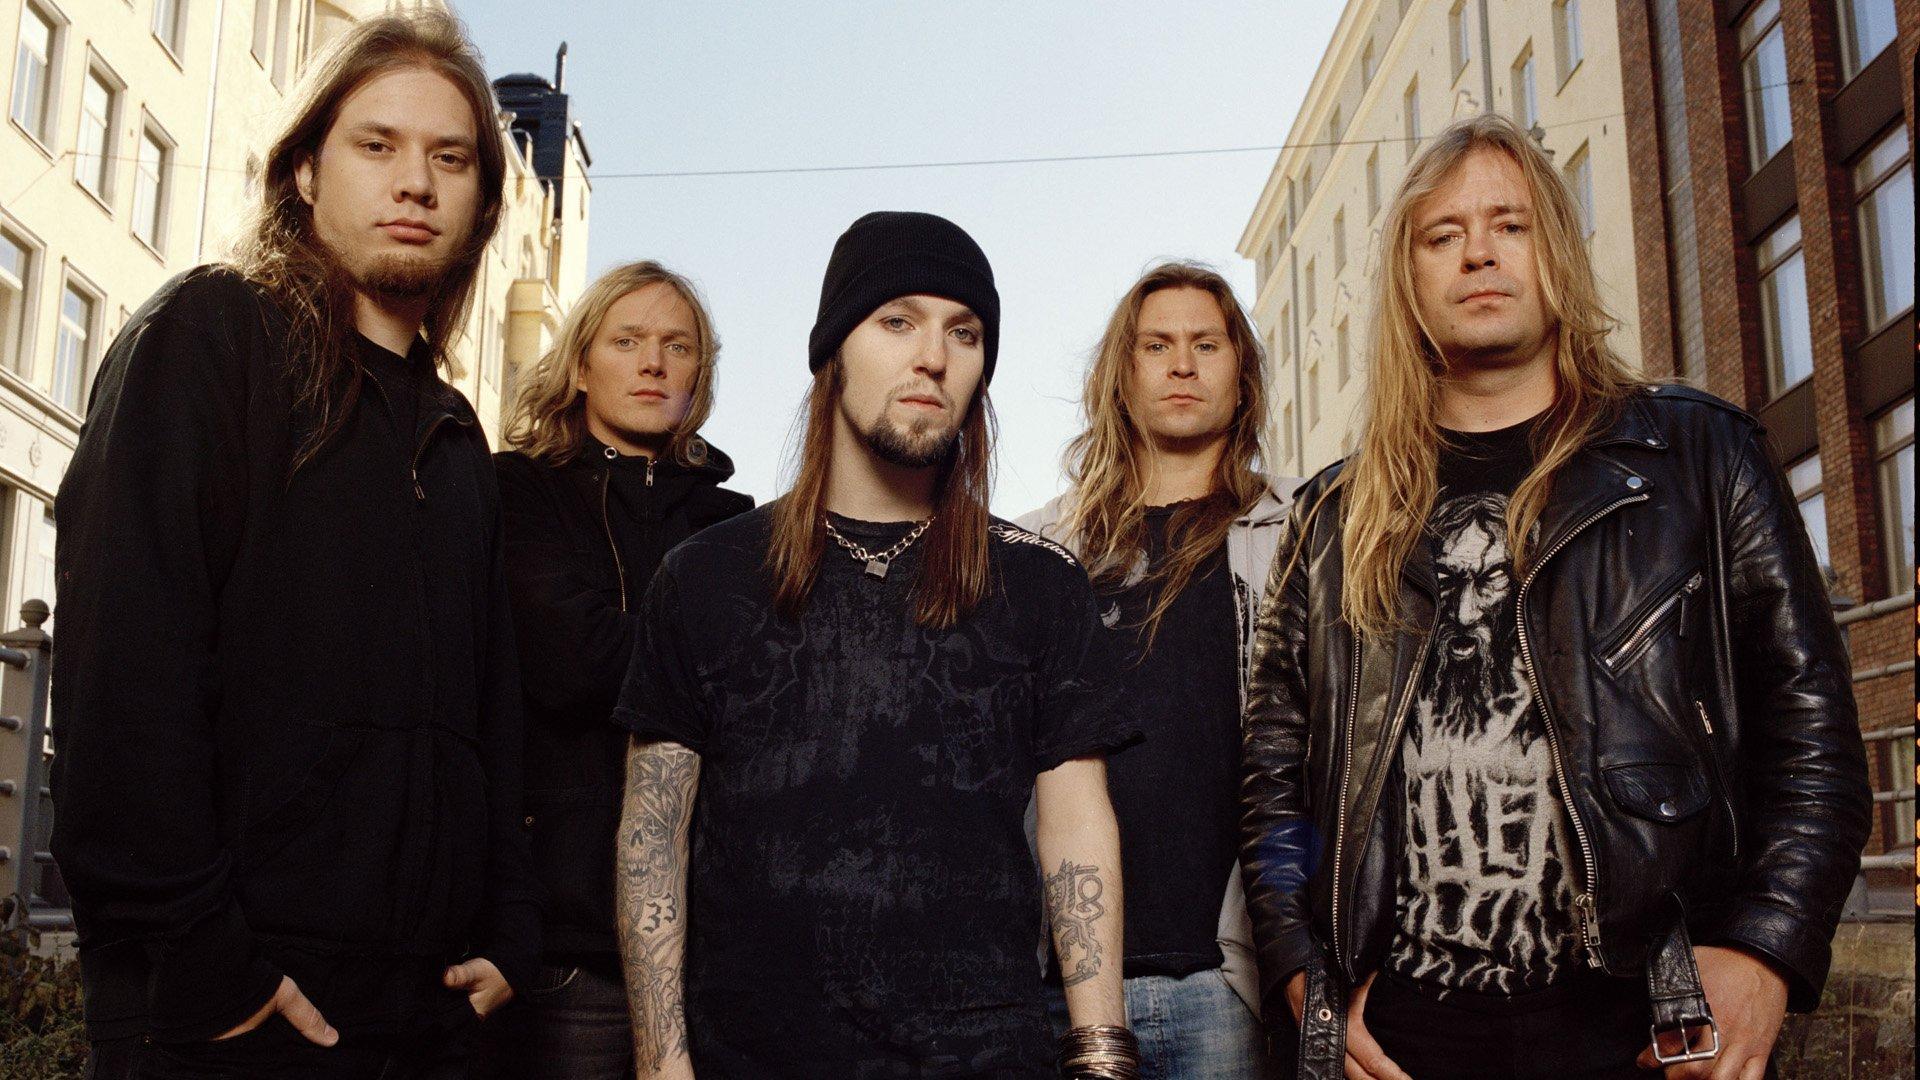 Music - Children Of Bodom  Heavy Metal Thrash Metal Death Metal Wallpaper